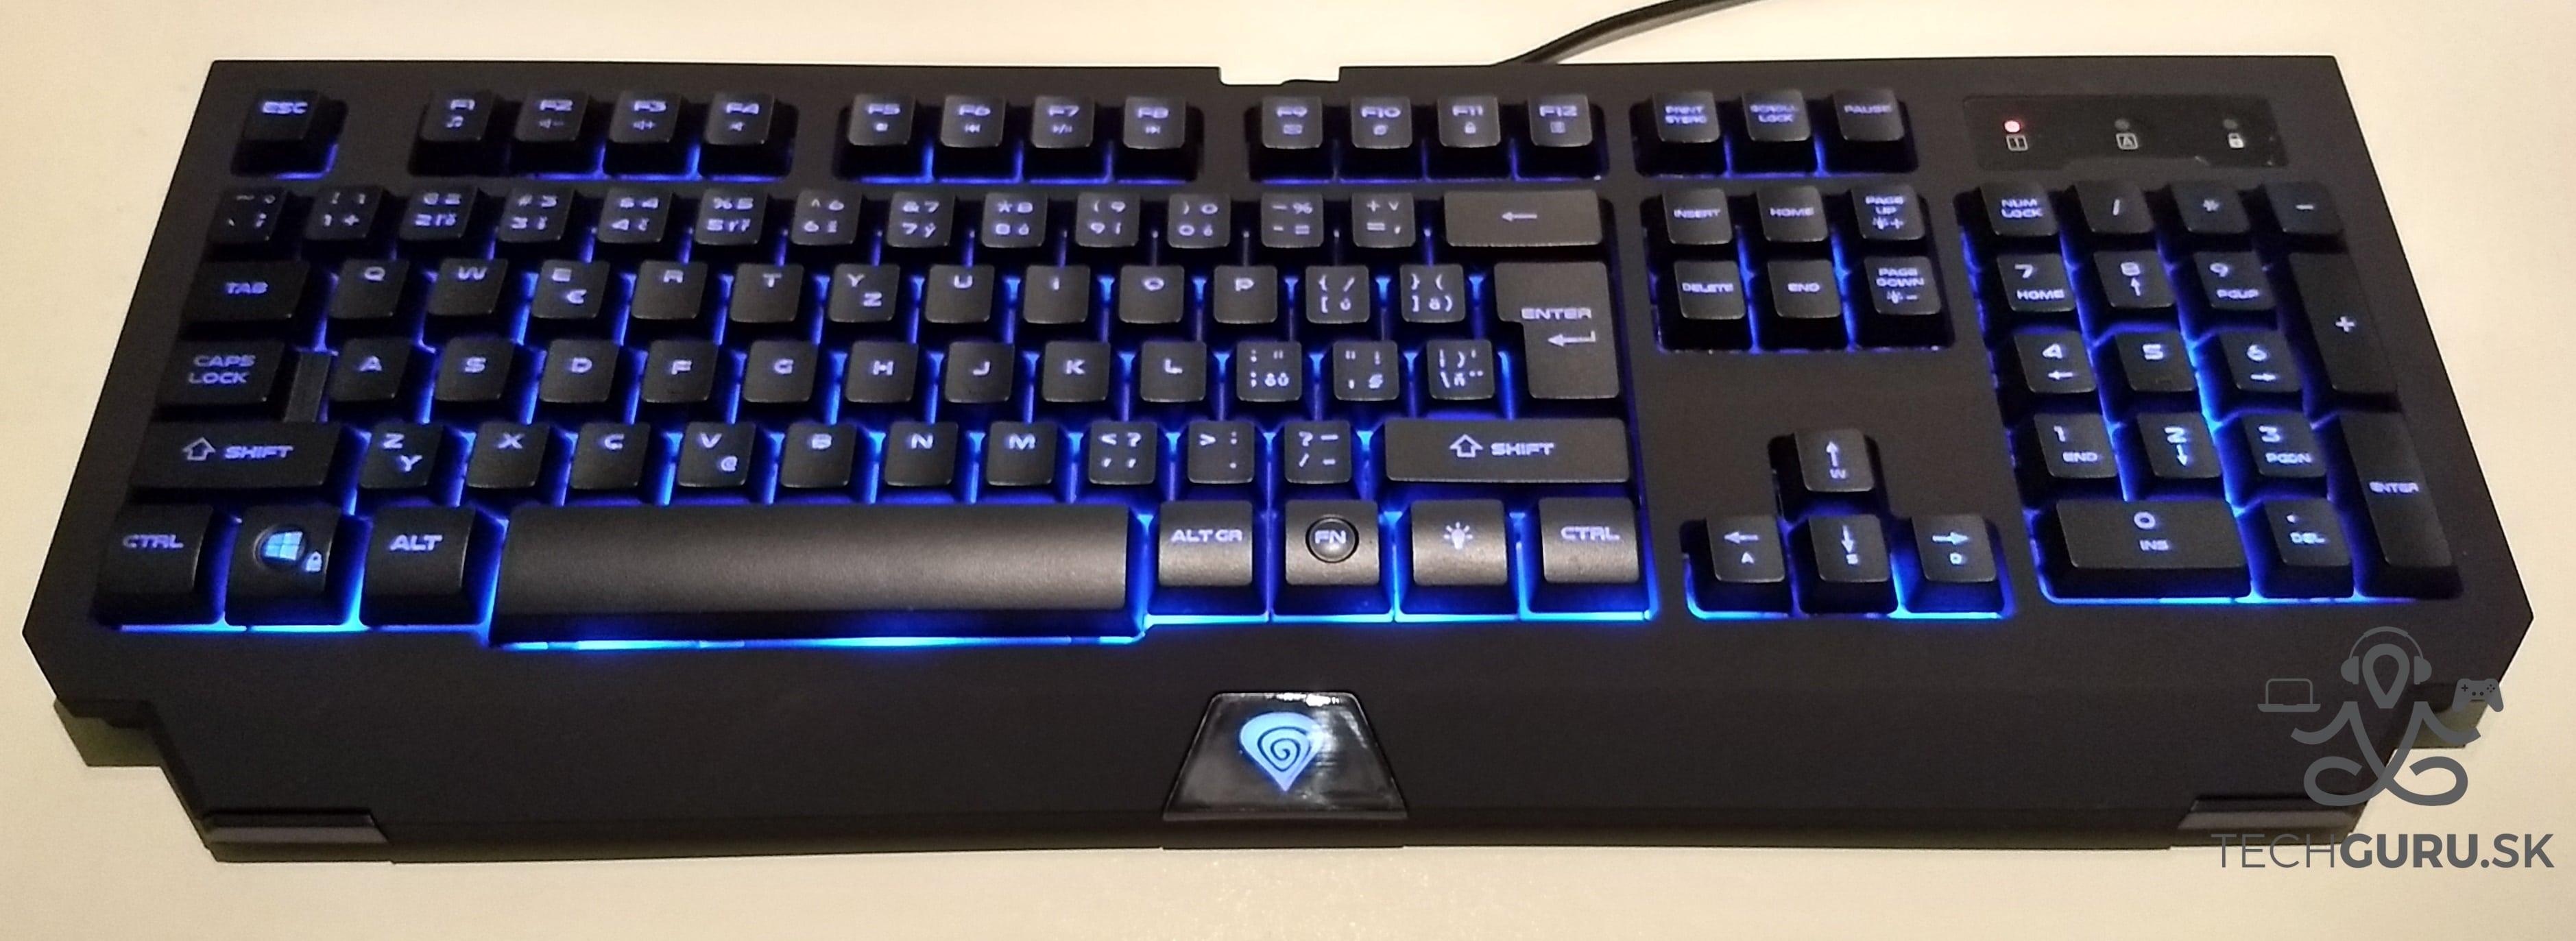 Genesis Cobalt 300 klávesnica podsvietenie 03